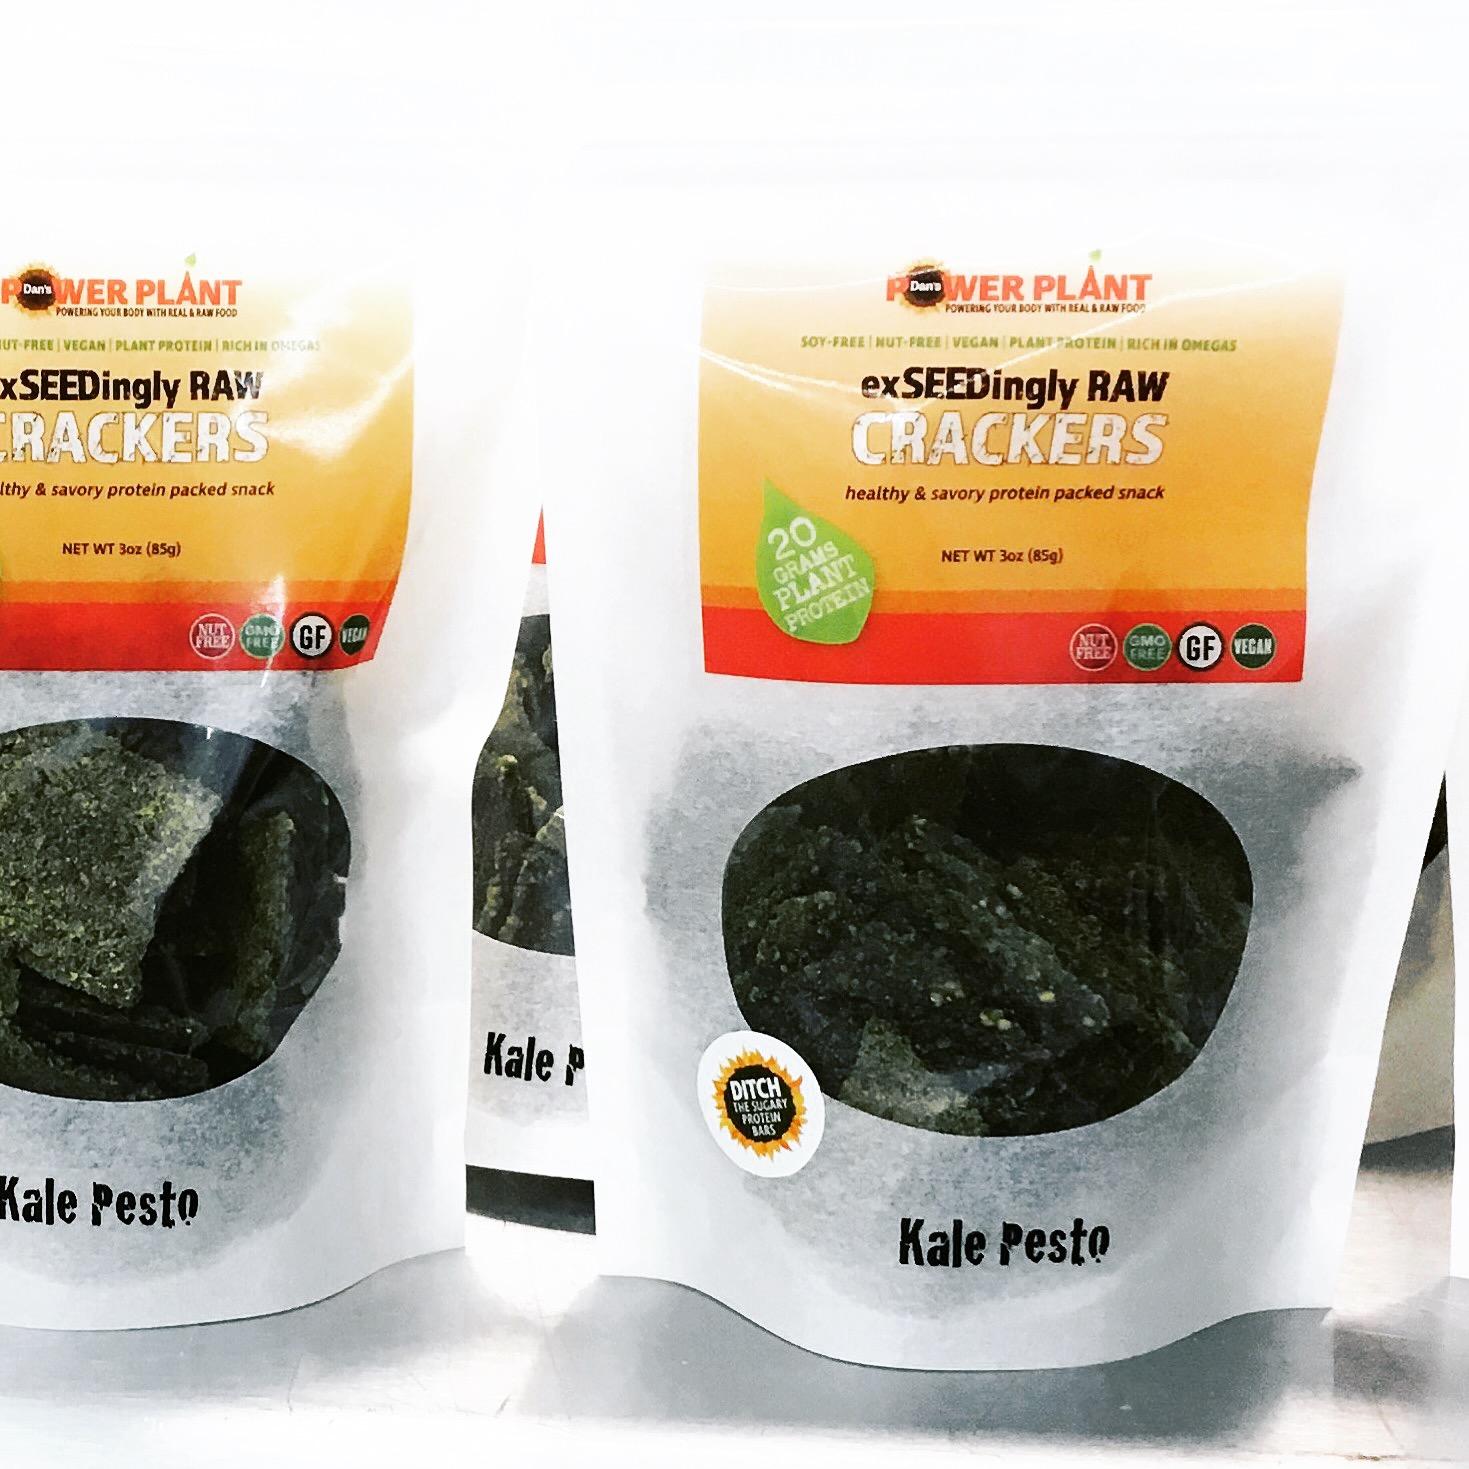 Kale Pesto exSEEDingly RAW Crackers